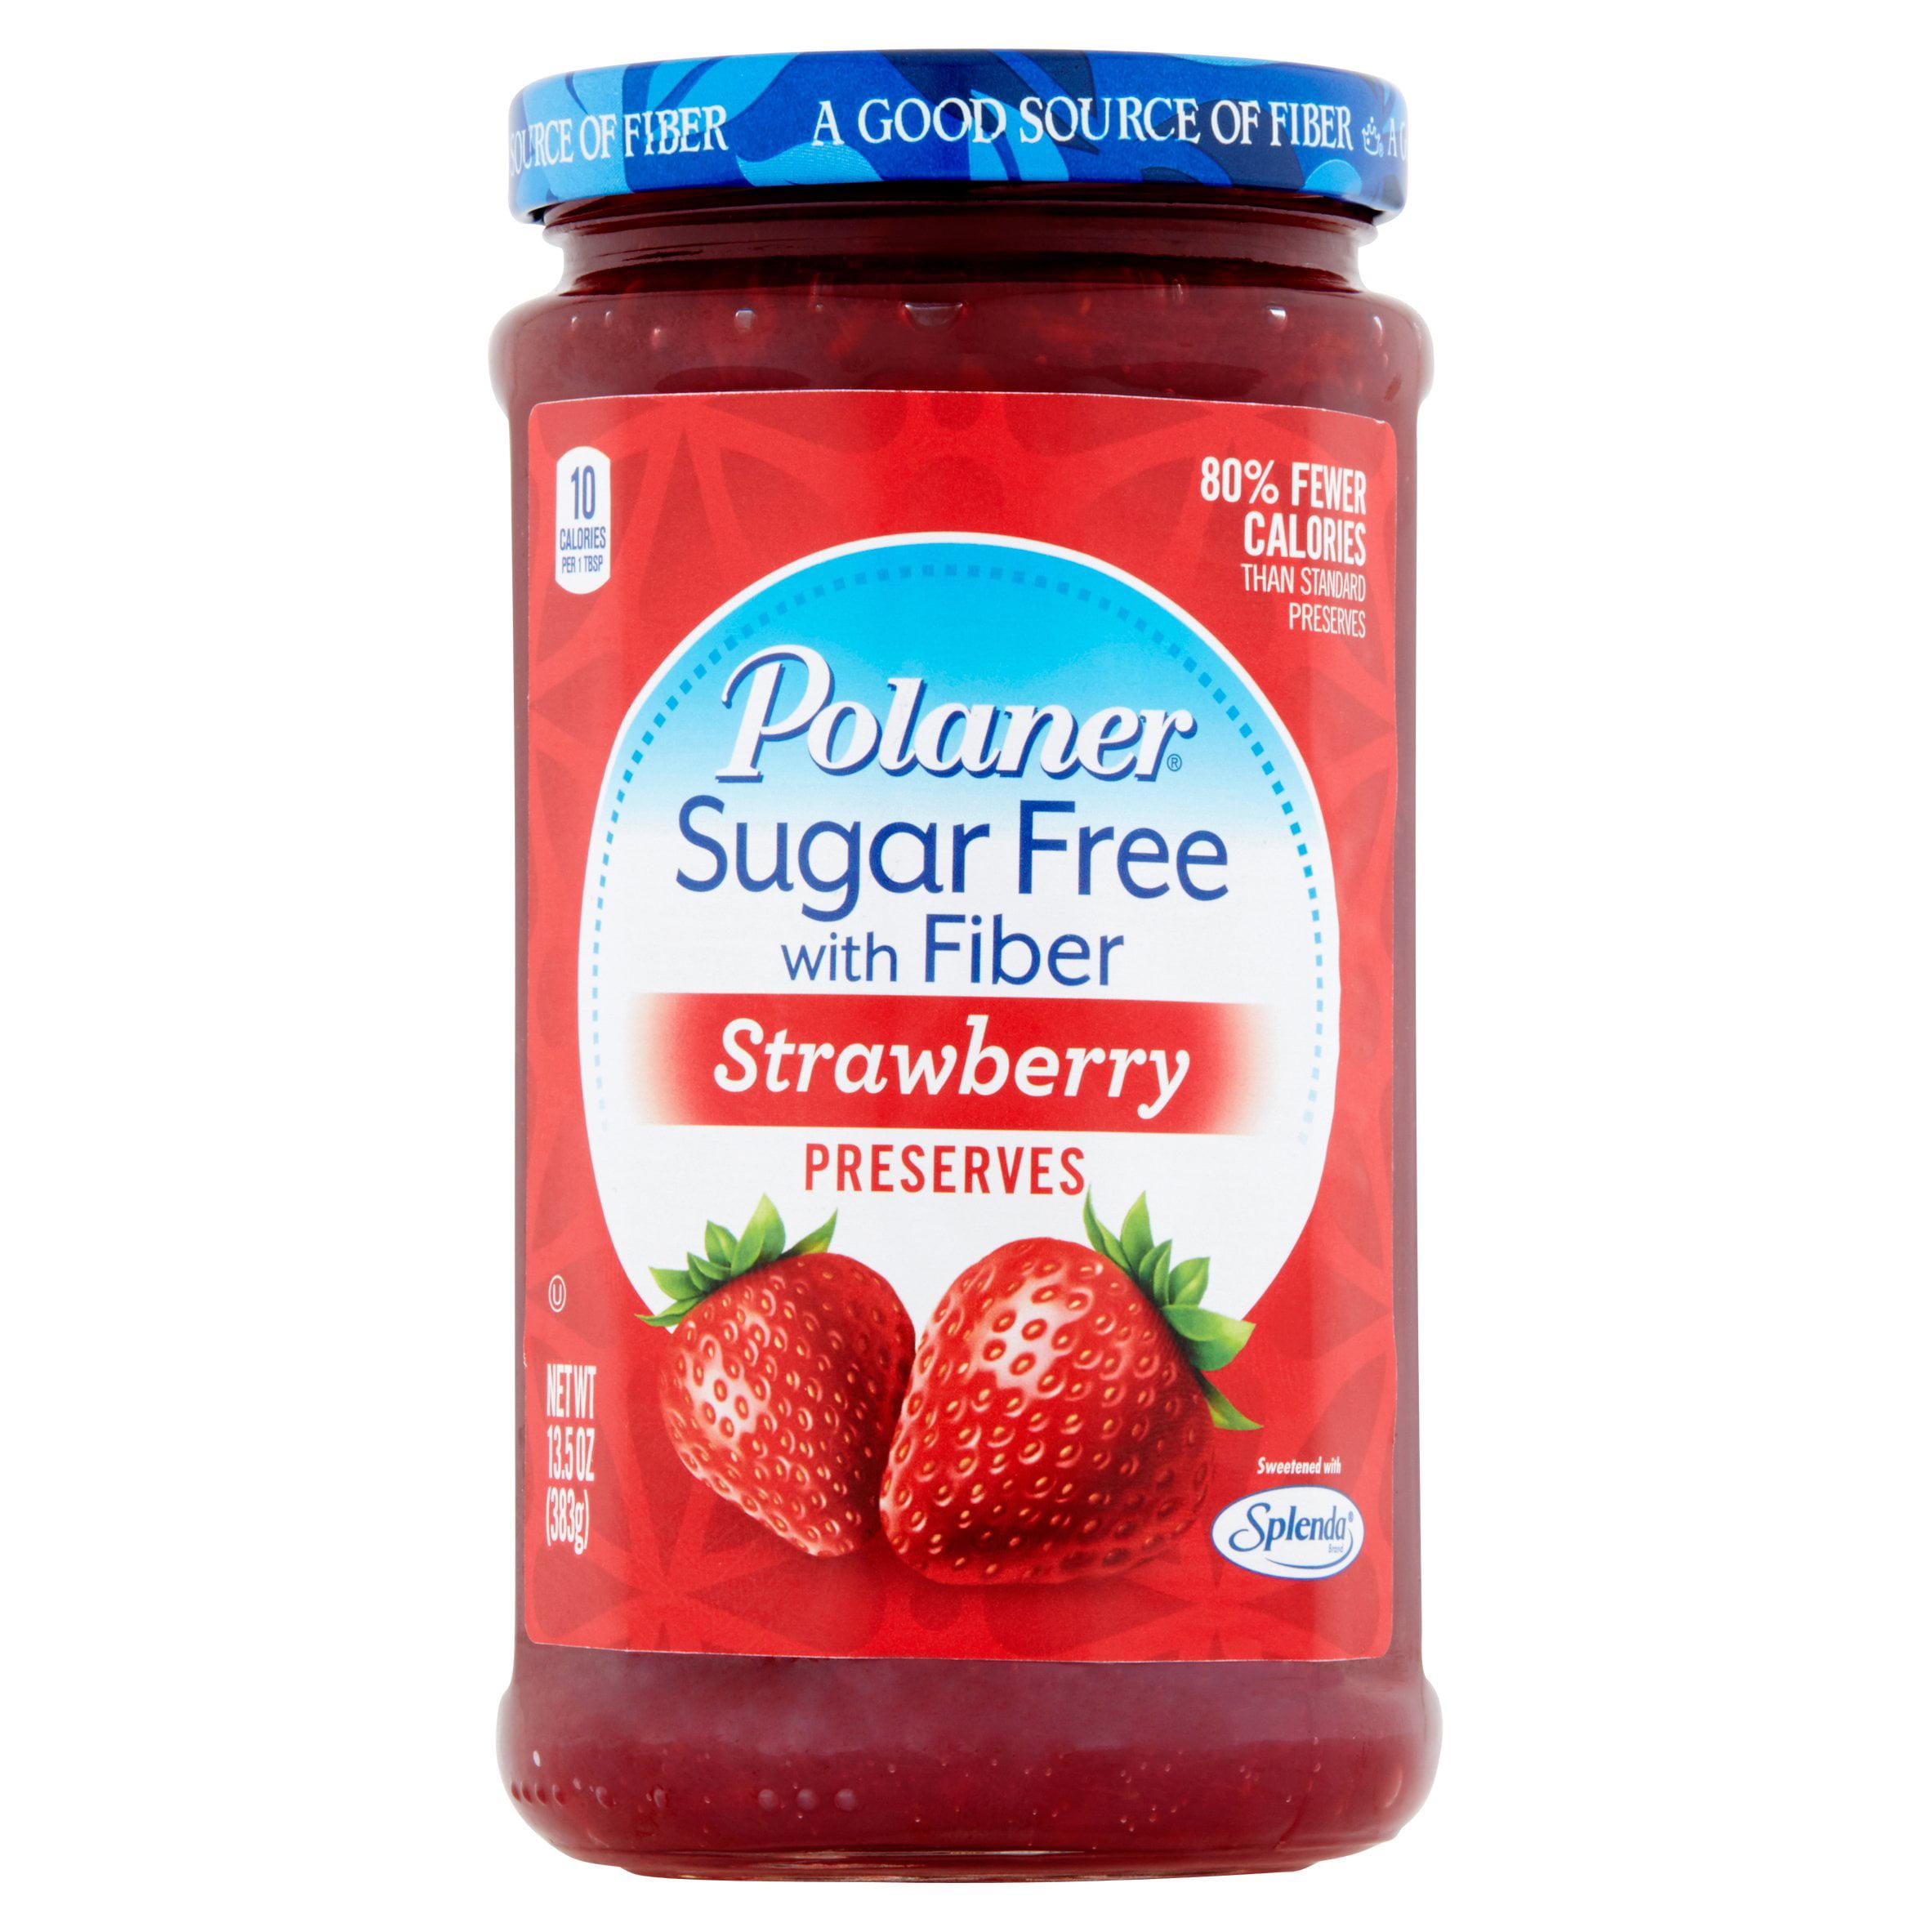 Polaner Strawberry Preserves, 13.5 oz